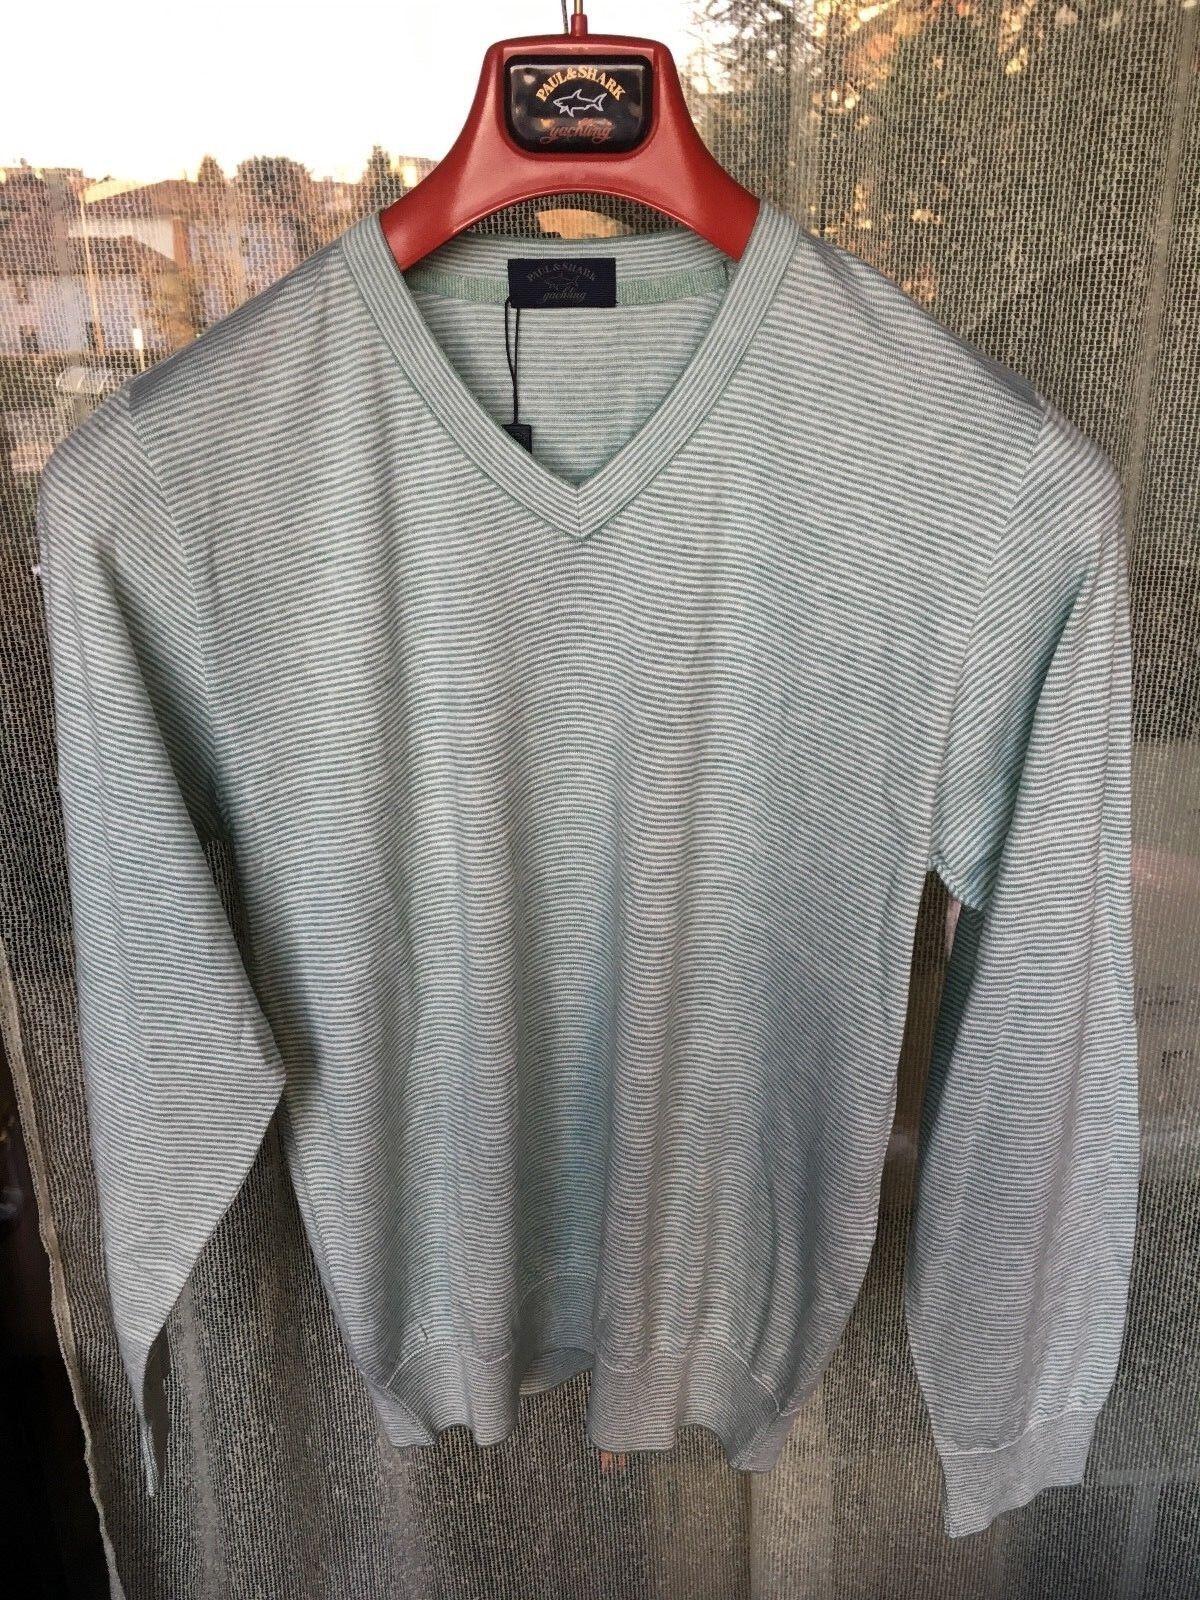 Pull a V  Paul Shark Luxury Collection,Cotone e Cashmire Pelle,Tg. M